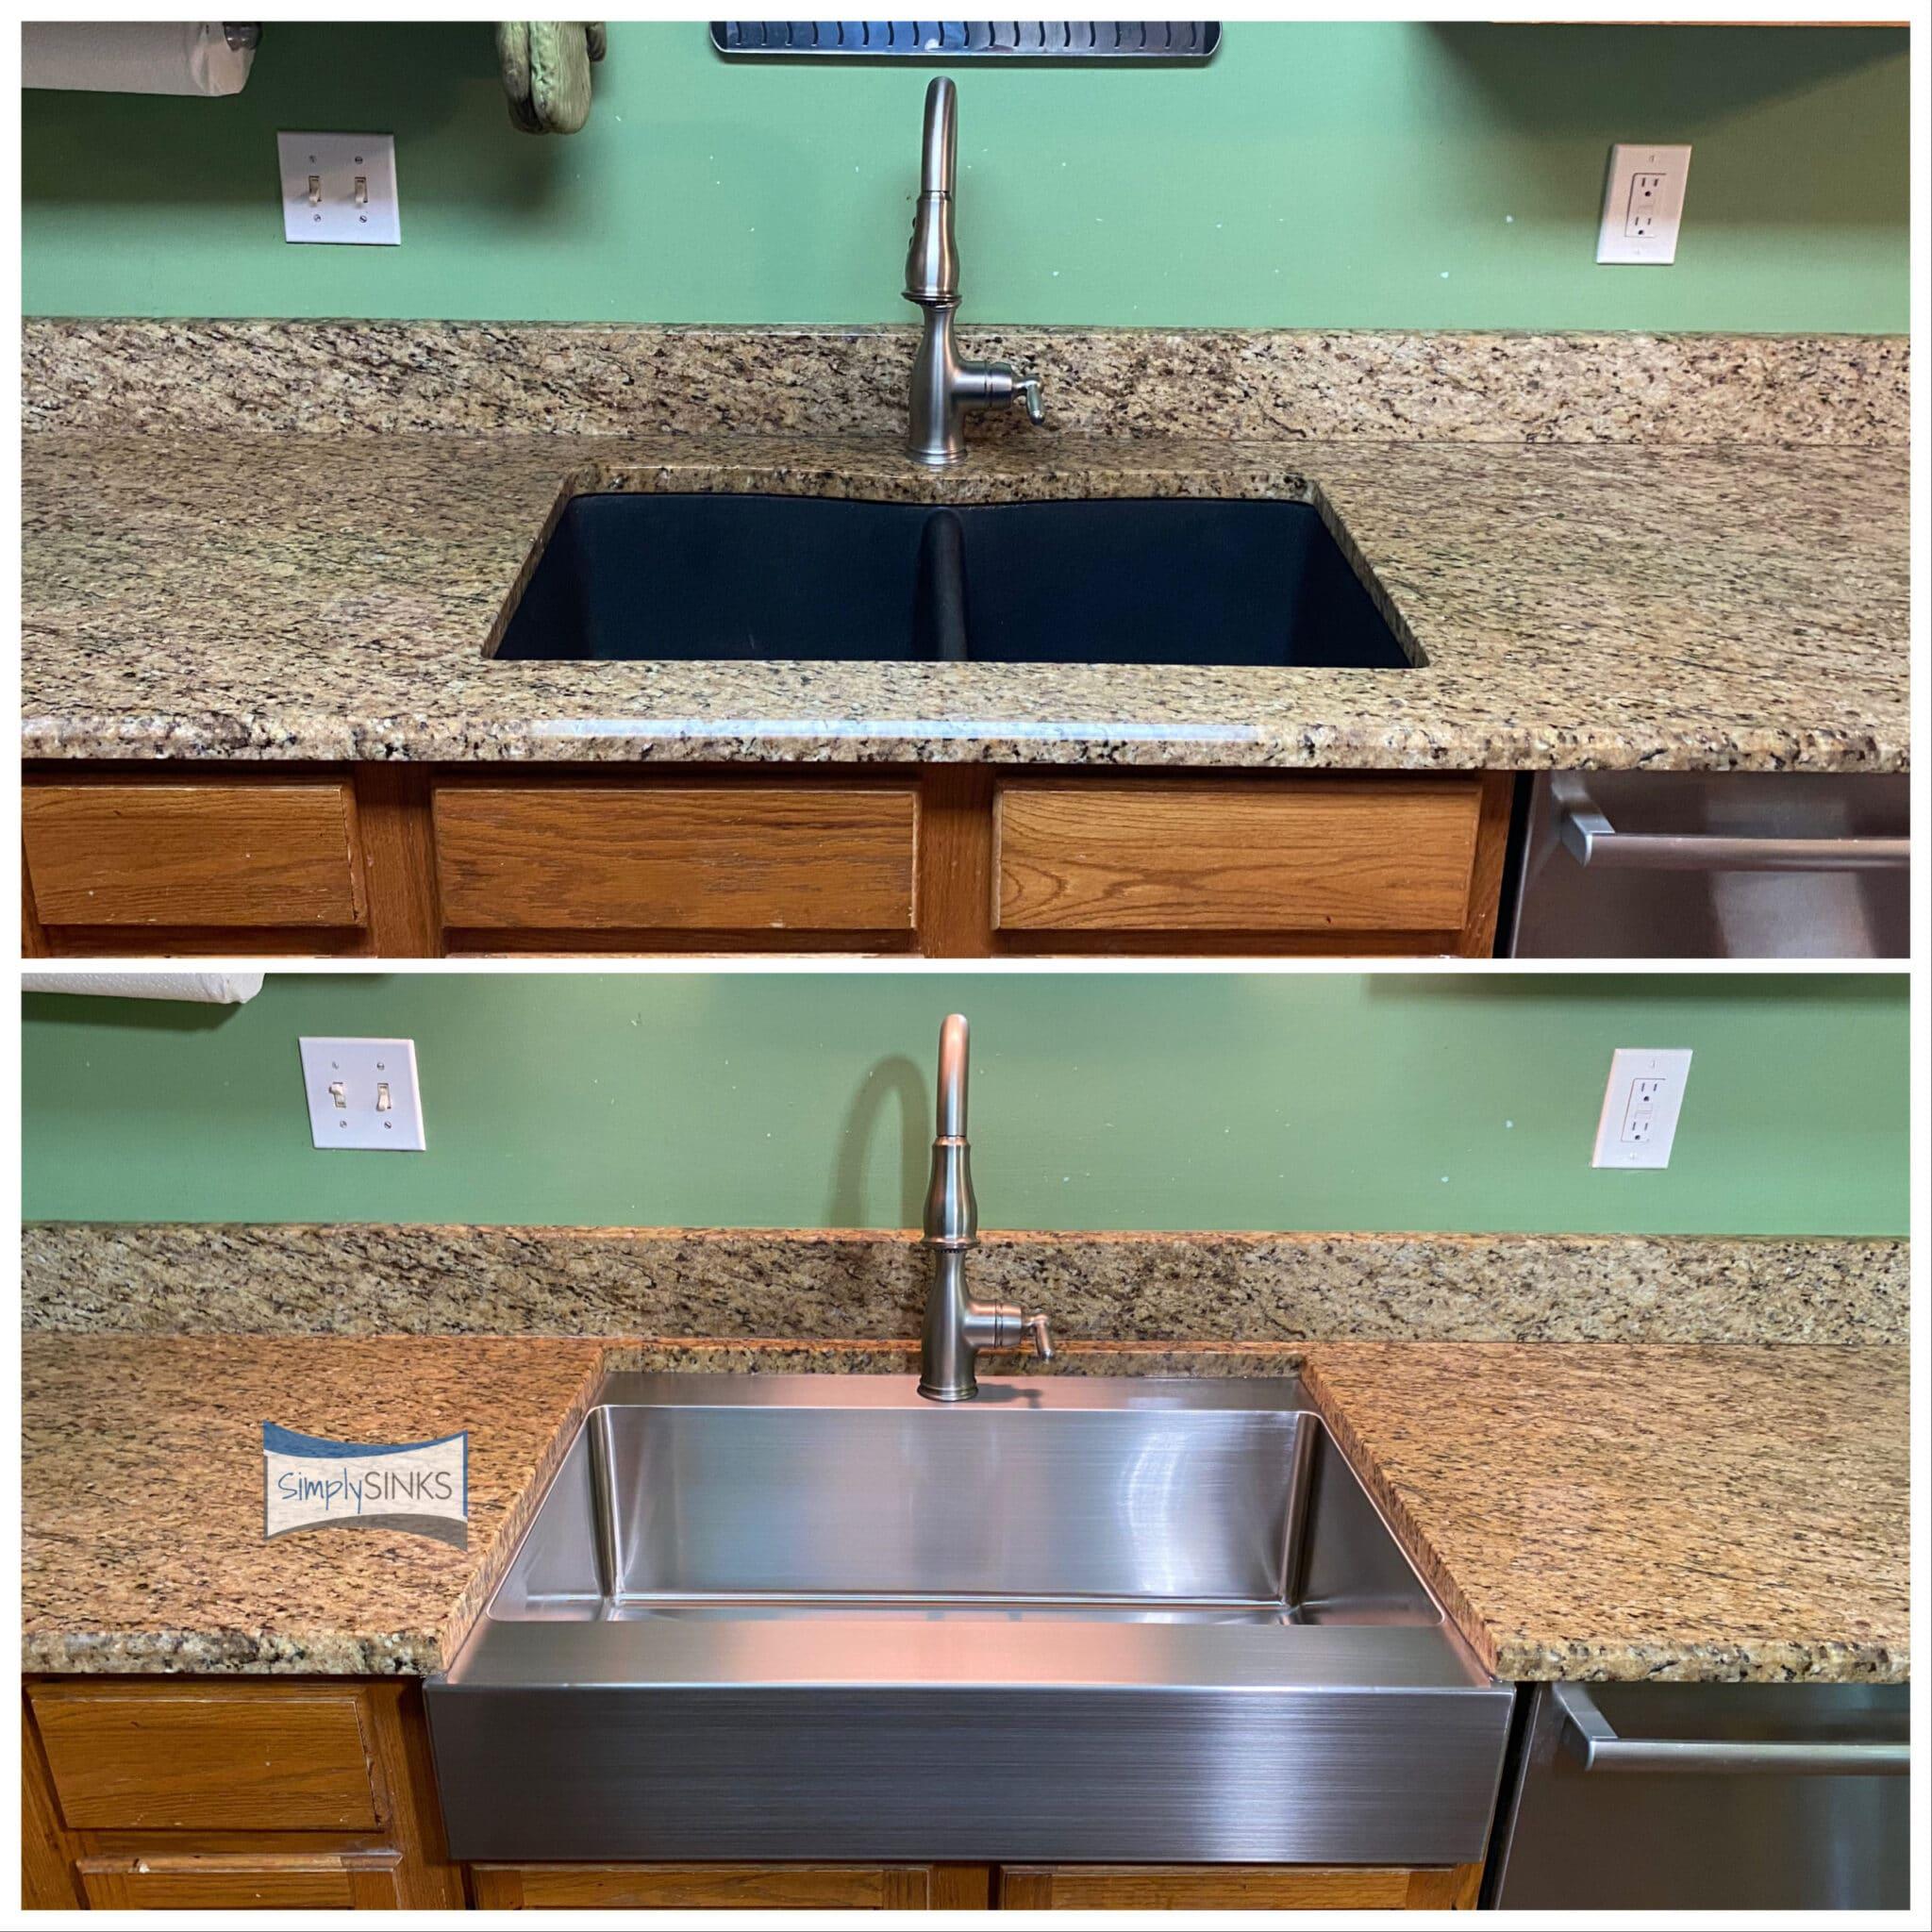 old sink versus new sink